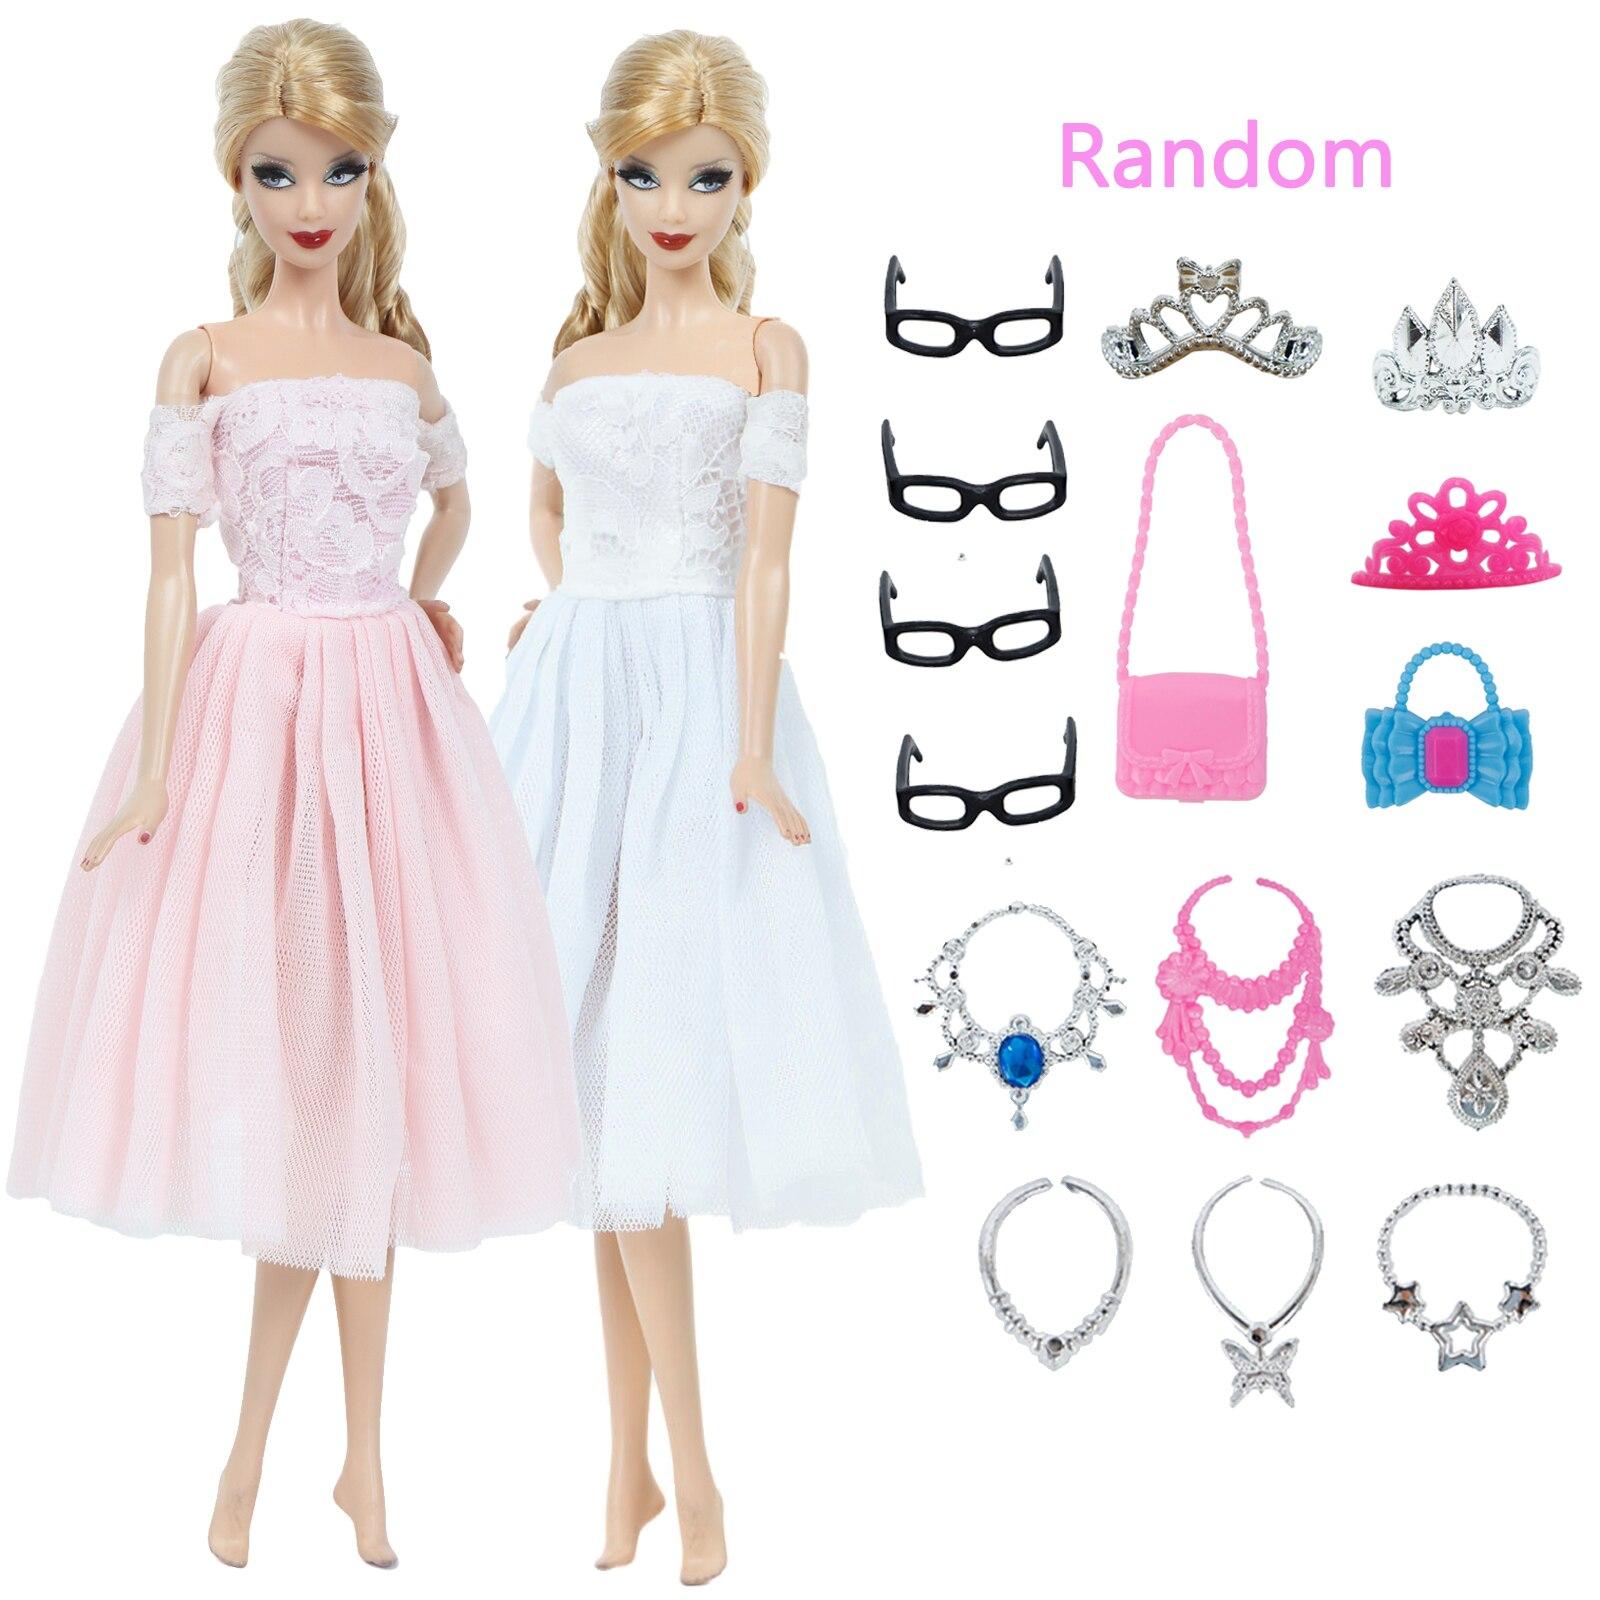 Random Lot Doll Clothes Gown Dress For Barbie Fashion Outfit Crown Bag shoes Set